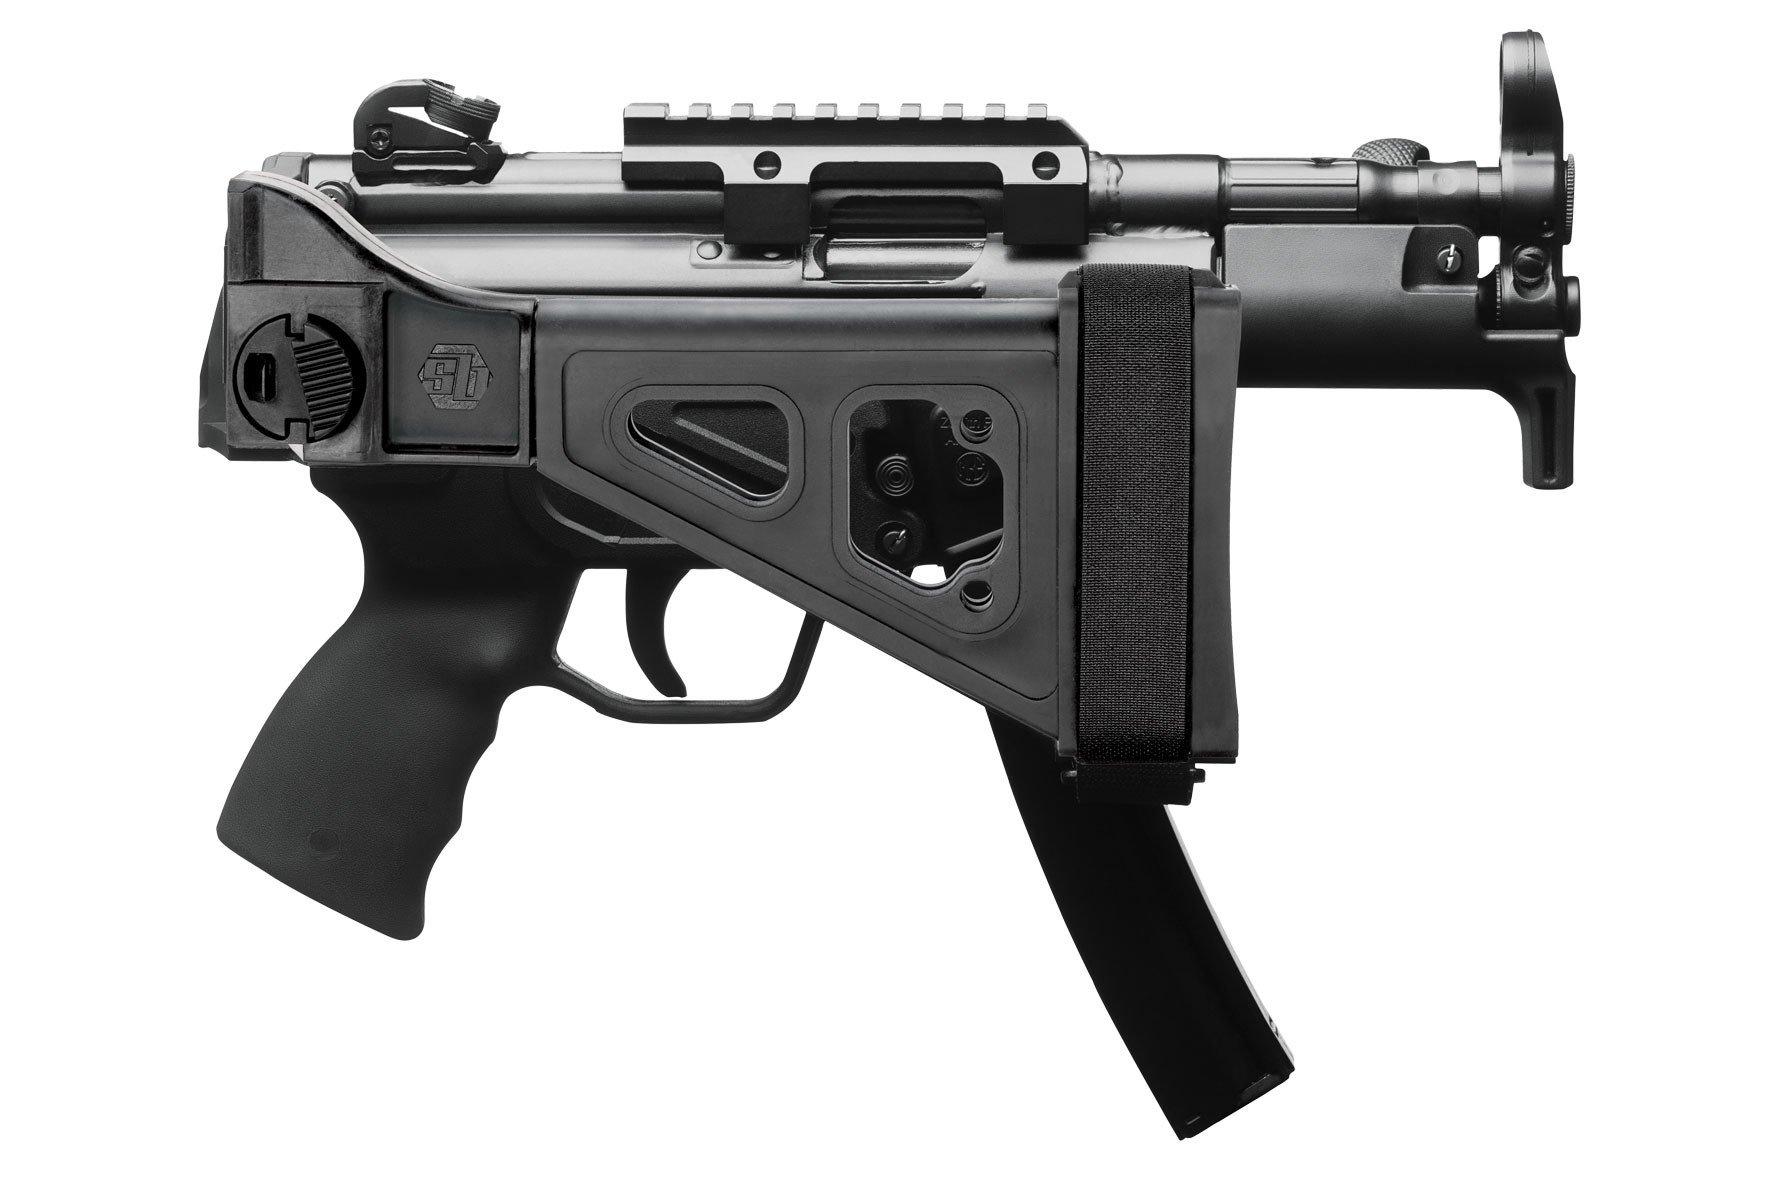 SB Tactical SBT5K Pistol Stabilizing Brace